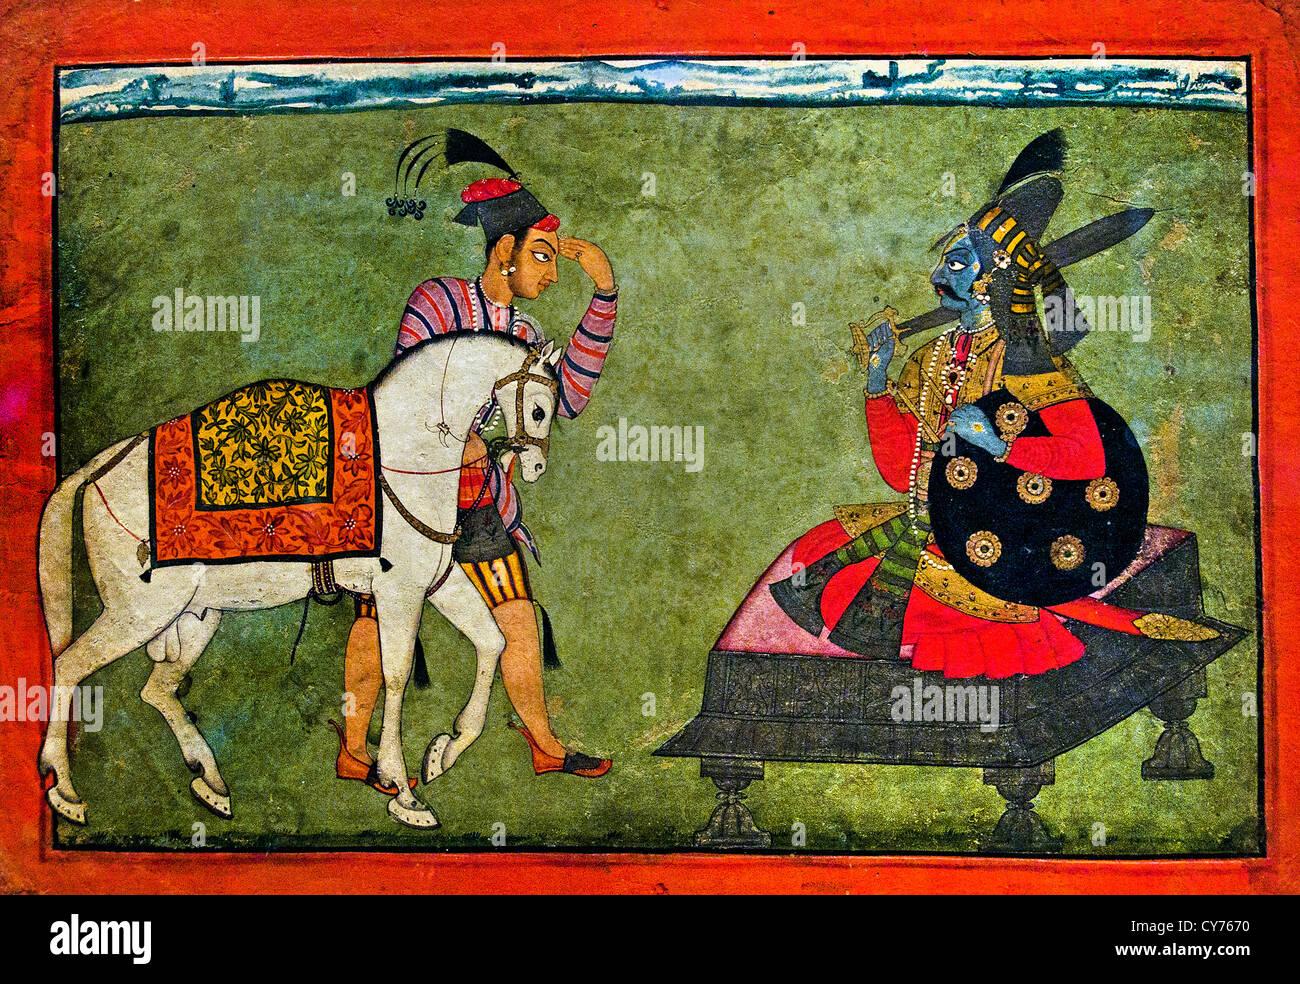 Kalki Avatar la futura incarnazione di Vishnu e Shiva Parvati giocando Chaupar Rasamanjari 700 India Basohli Jammu Immagini Stock